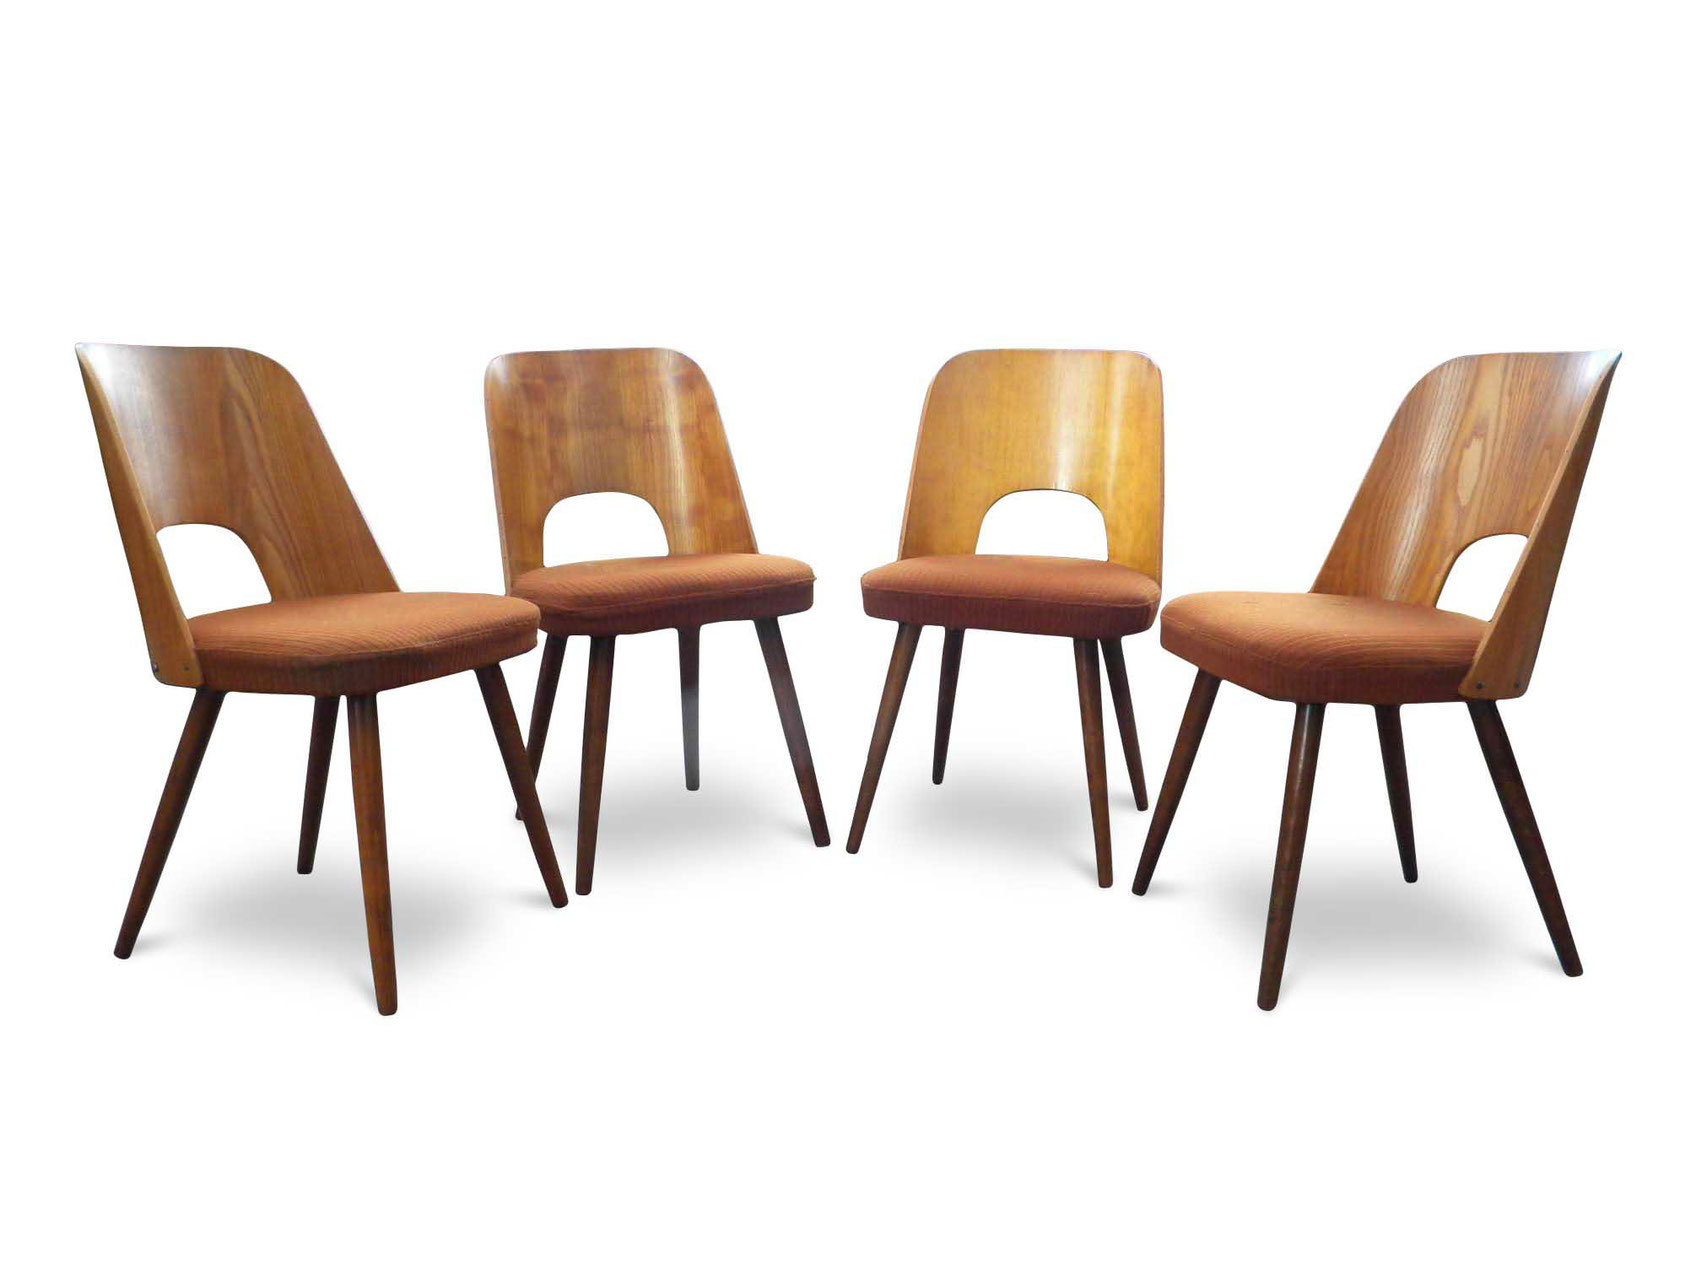 Sedie vintage anni 50 modernariato italian vintage sofa for Sedie vintage design